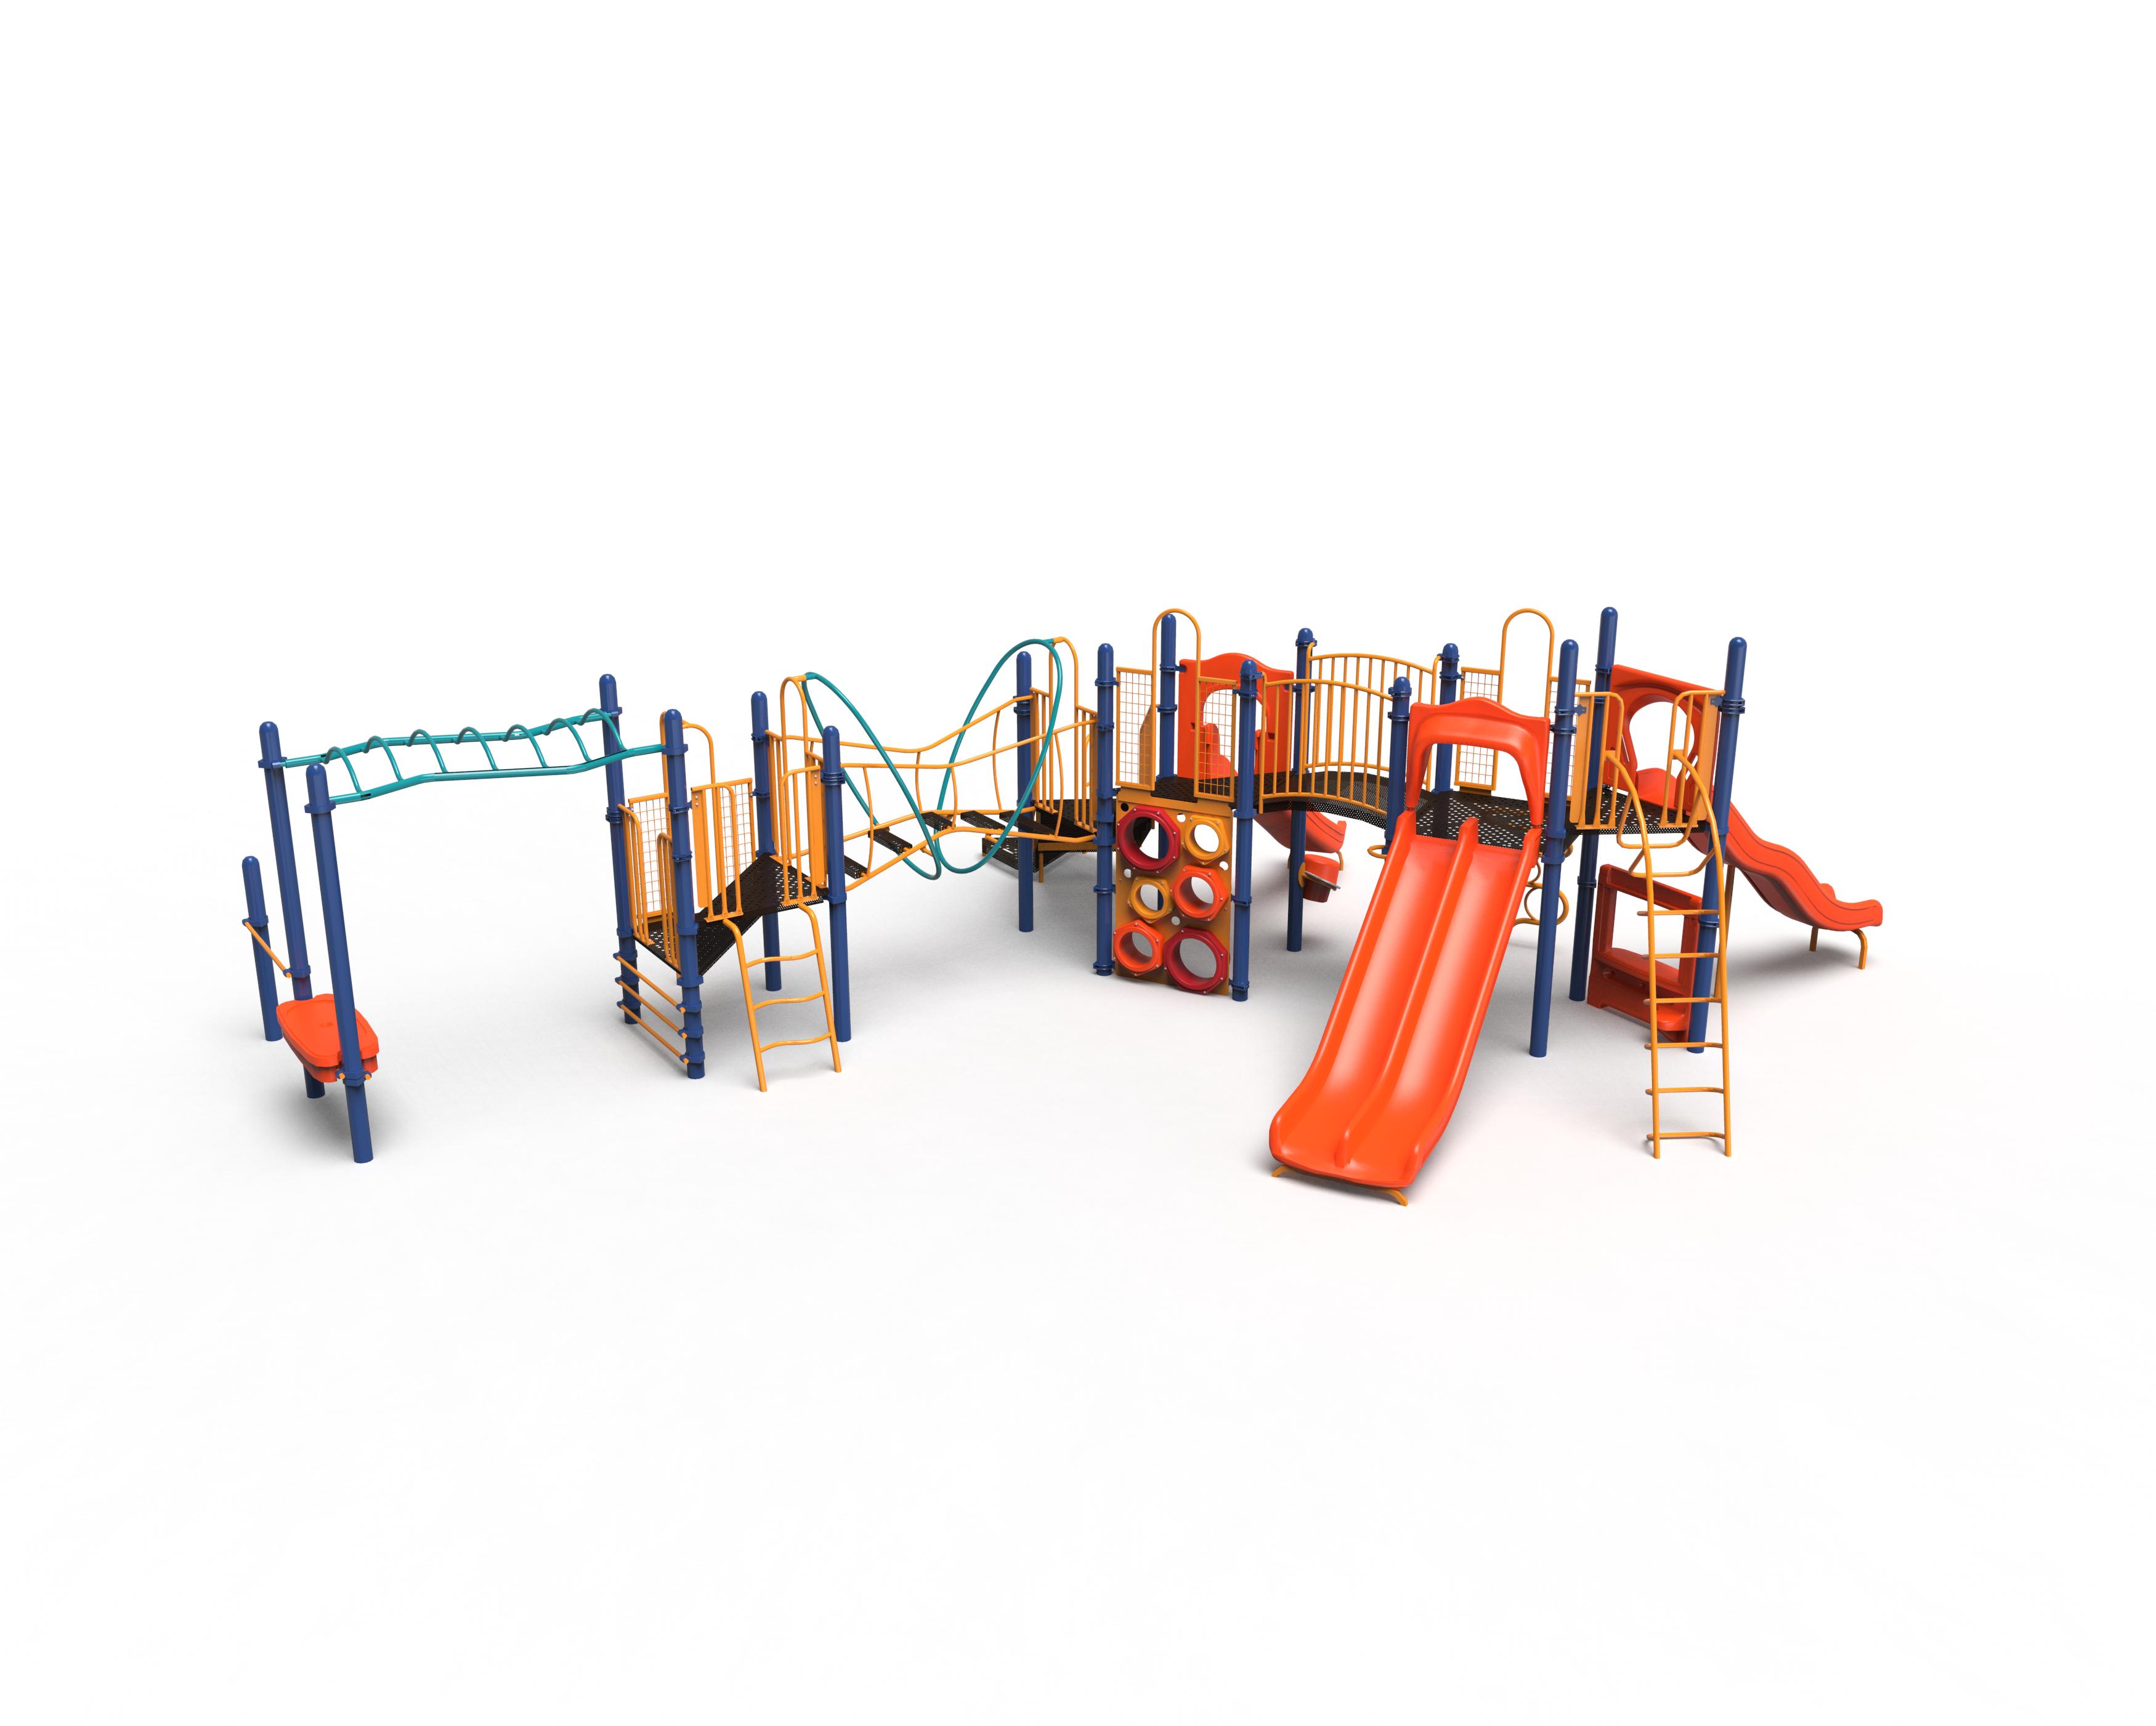 KAWKB72510 (Kid Builders) (KAWKB72510)